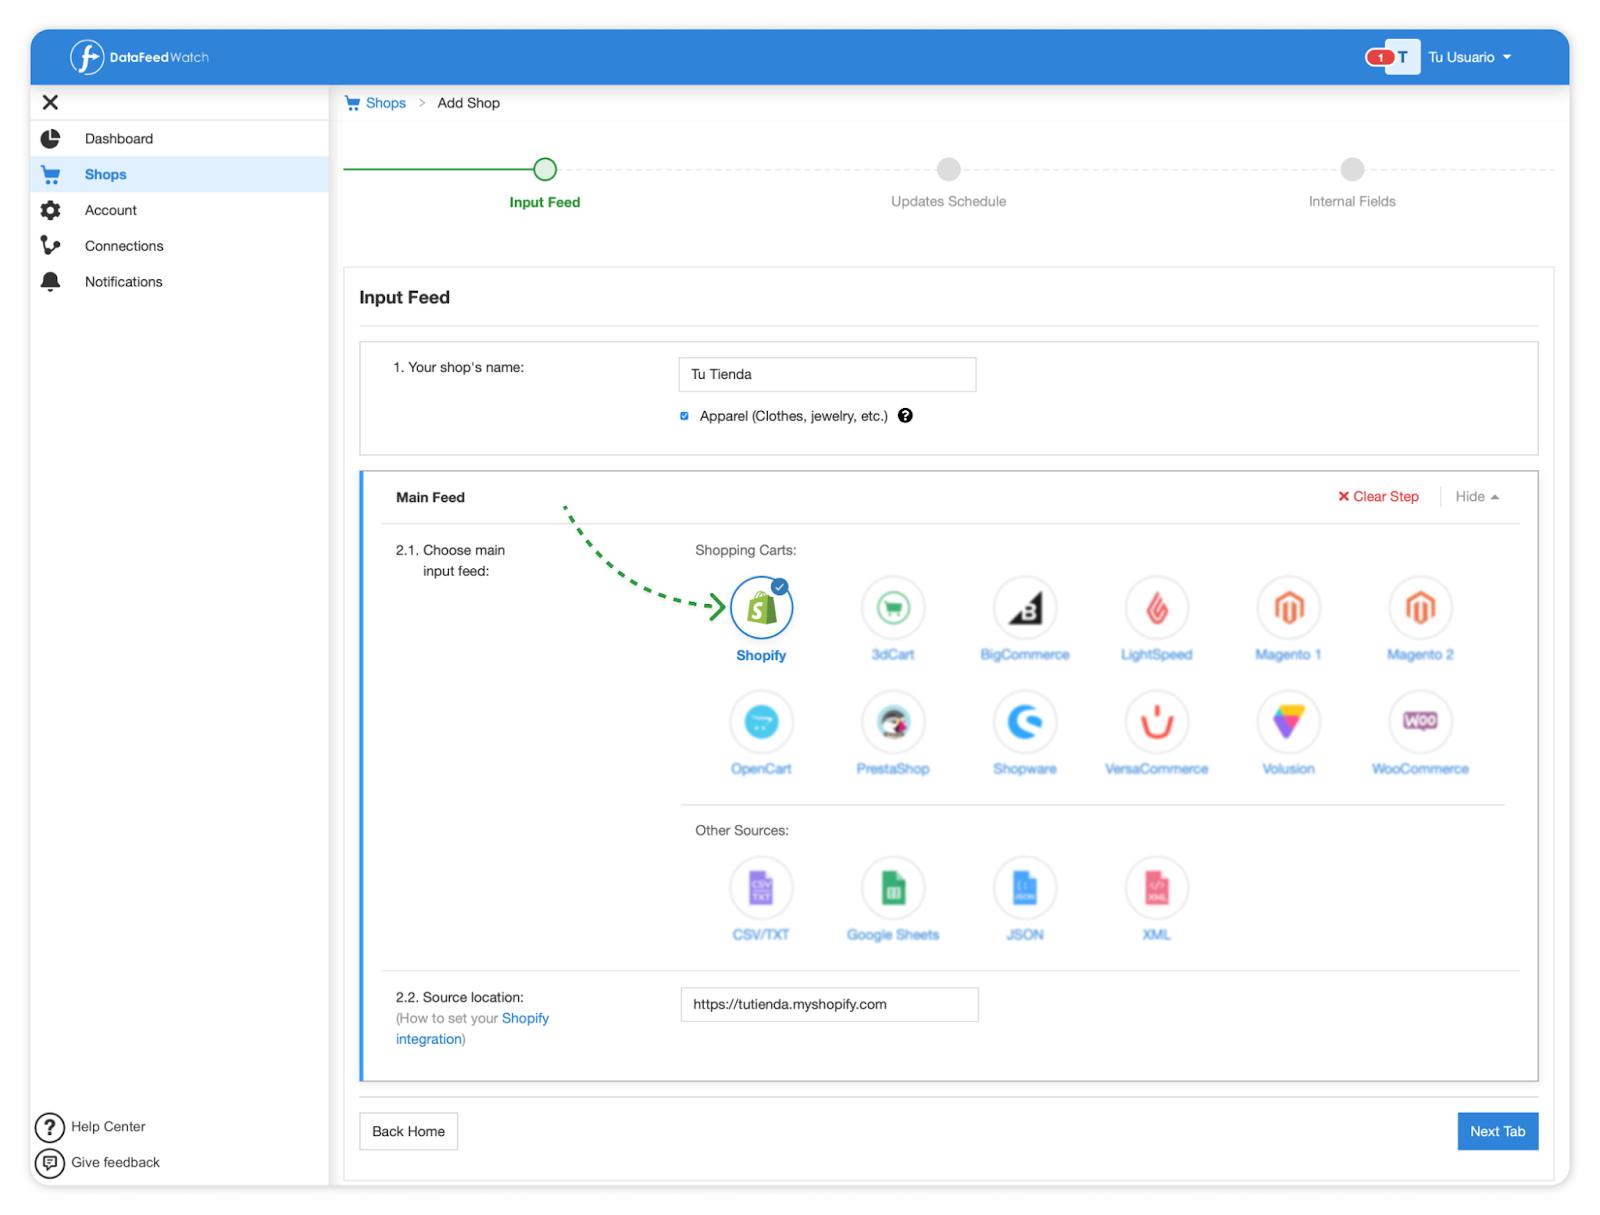 crear tienda online shopify datafeedwatch